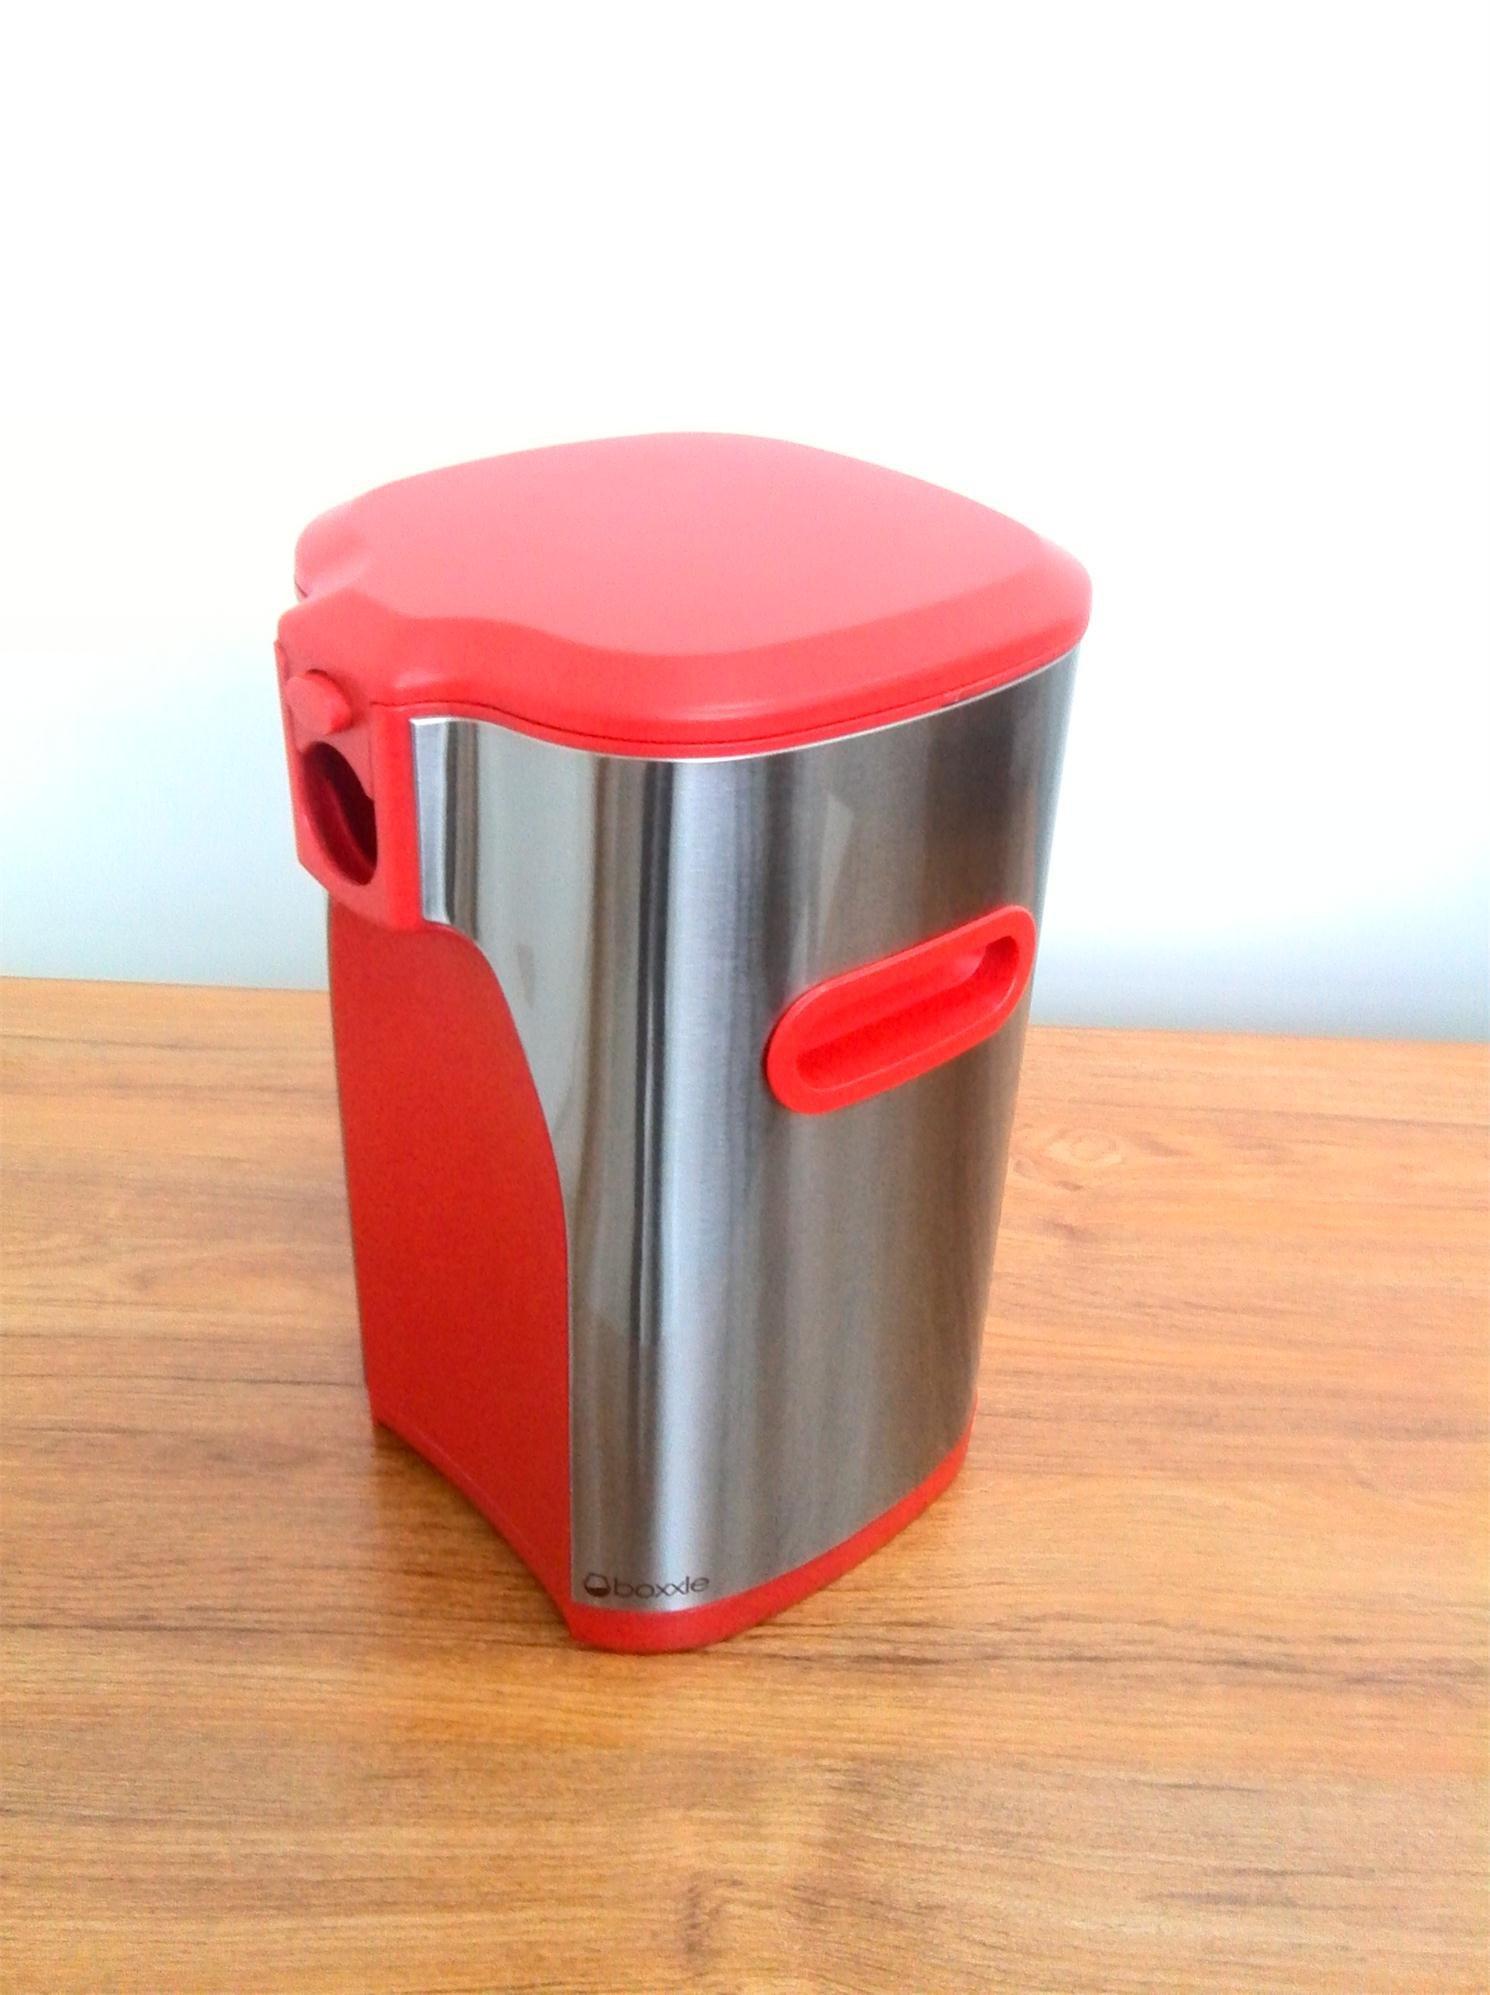 Boxxle Premium 3 Liter Bag-in-Box Wine Dispenser (Red)